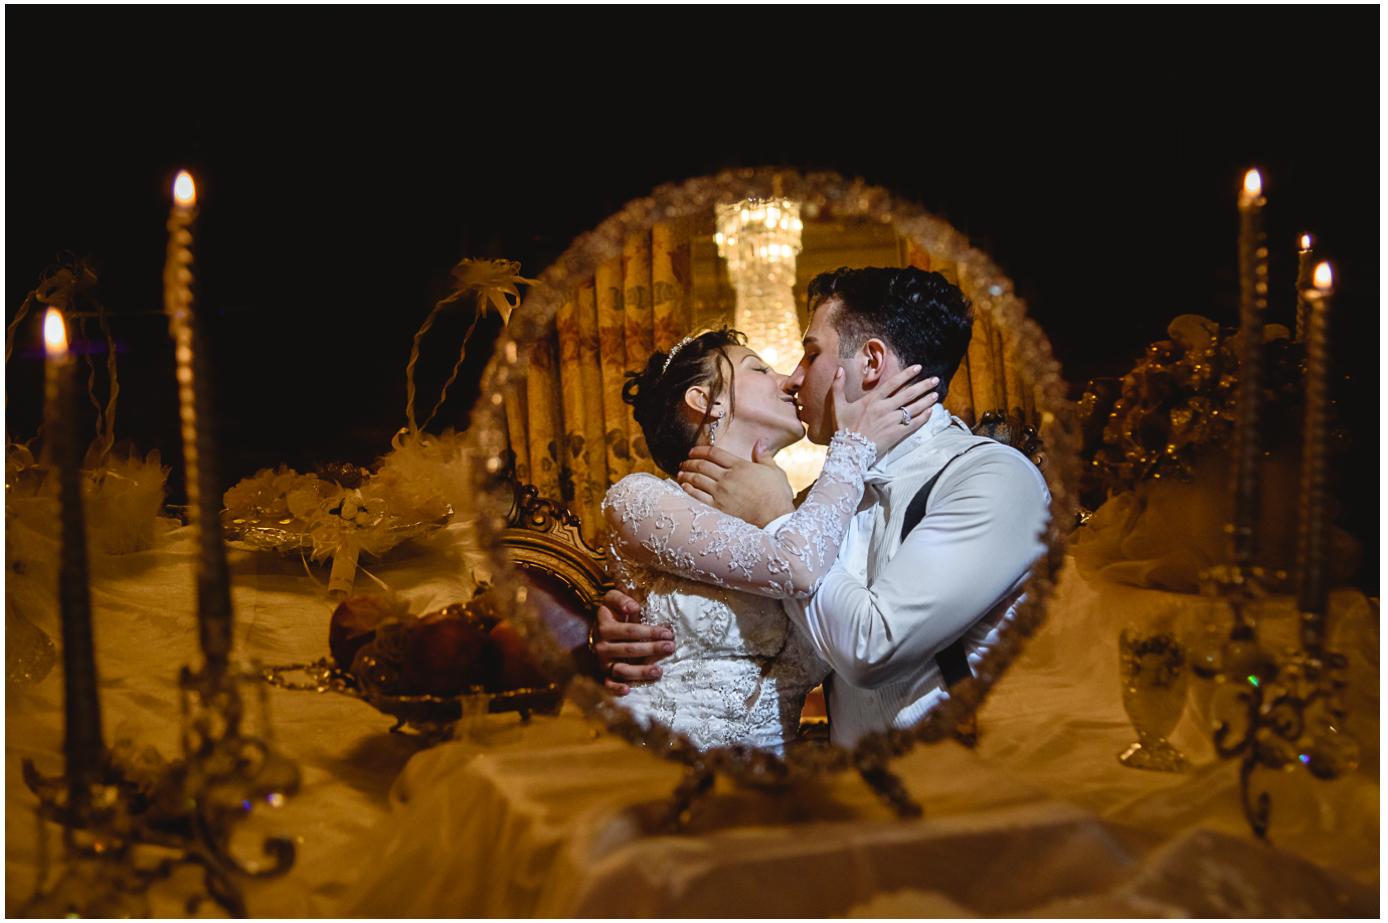 iranian wedding photographer 247 - Drapers Hall London Wedding Photographer